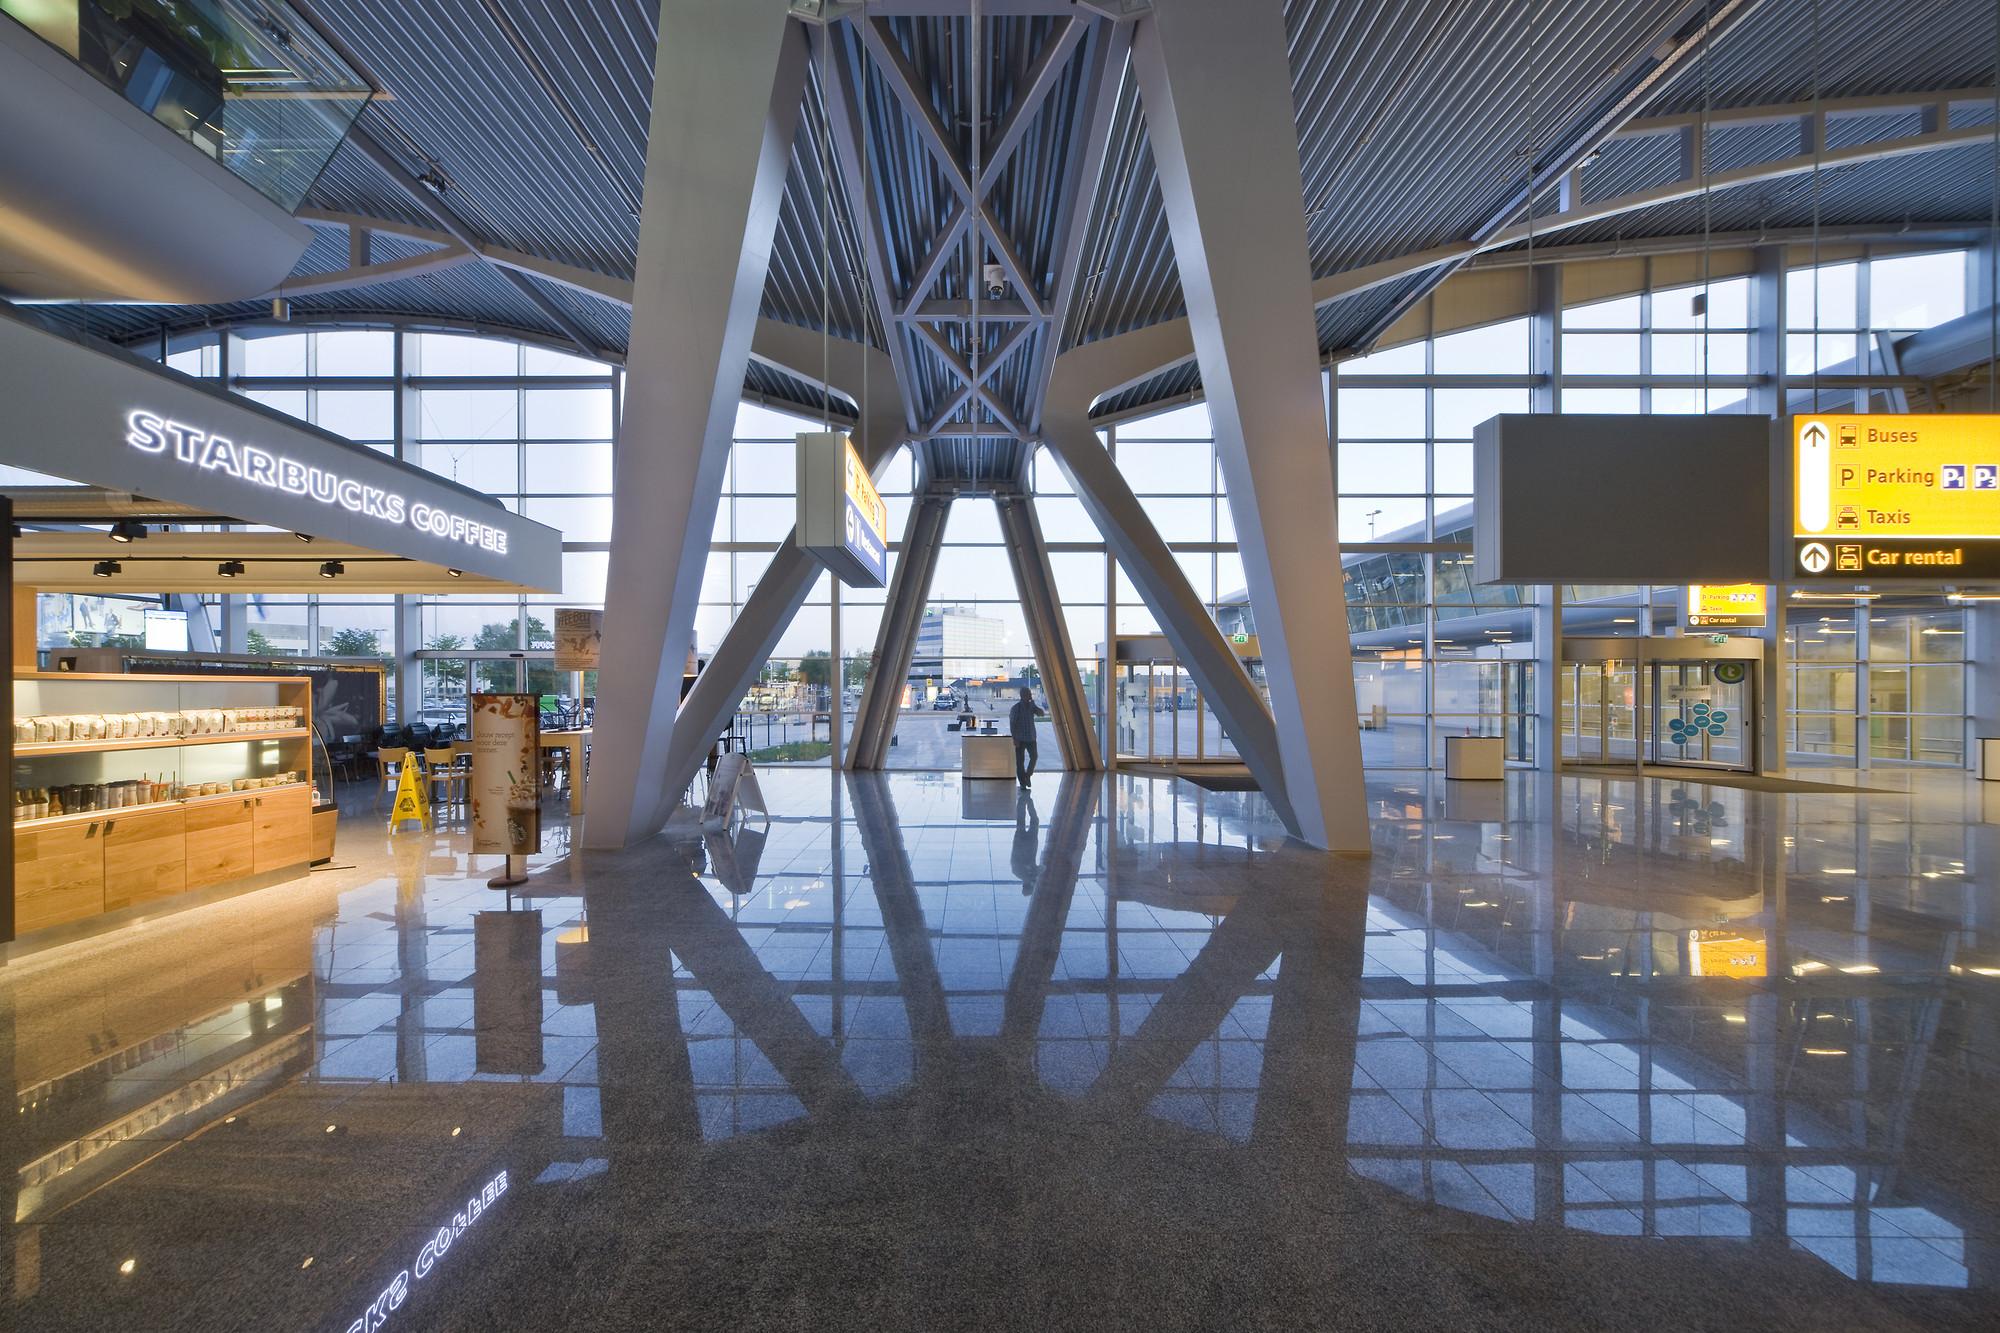 Hotel Eindhoven Airport